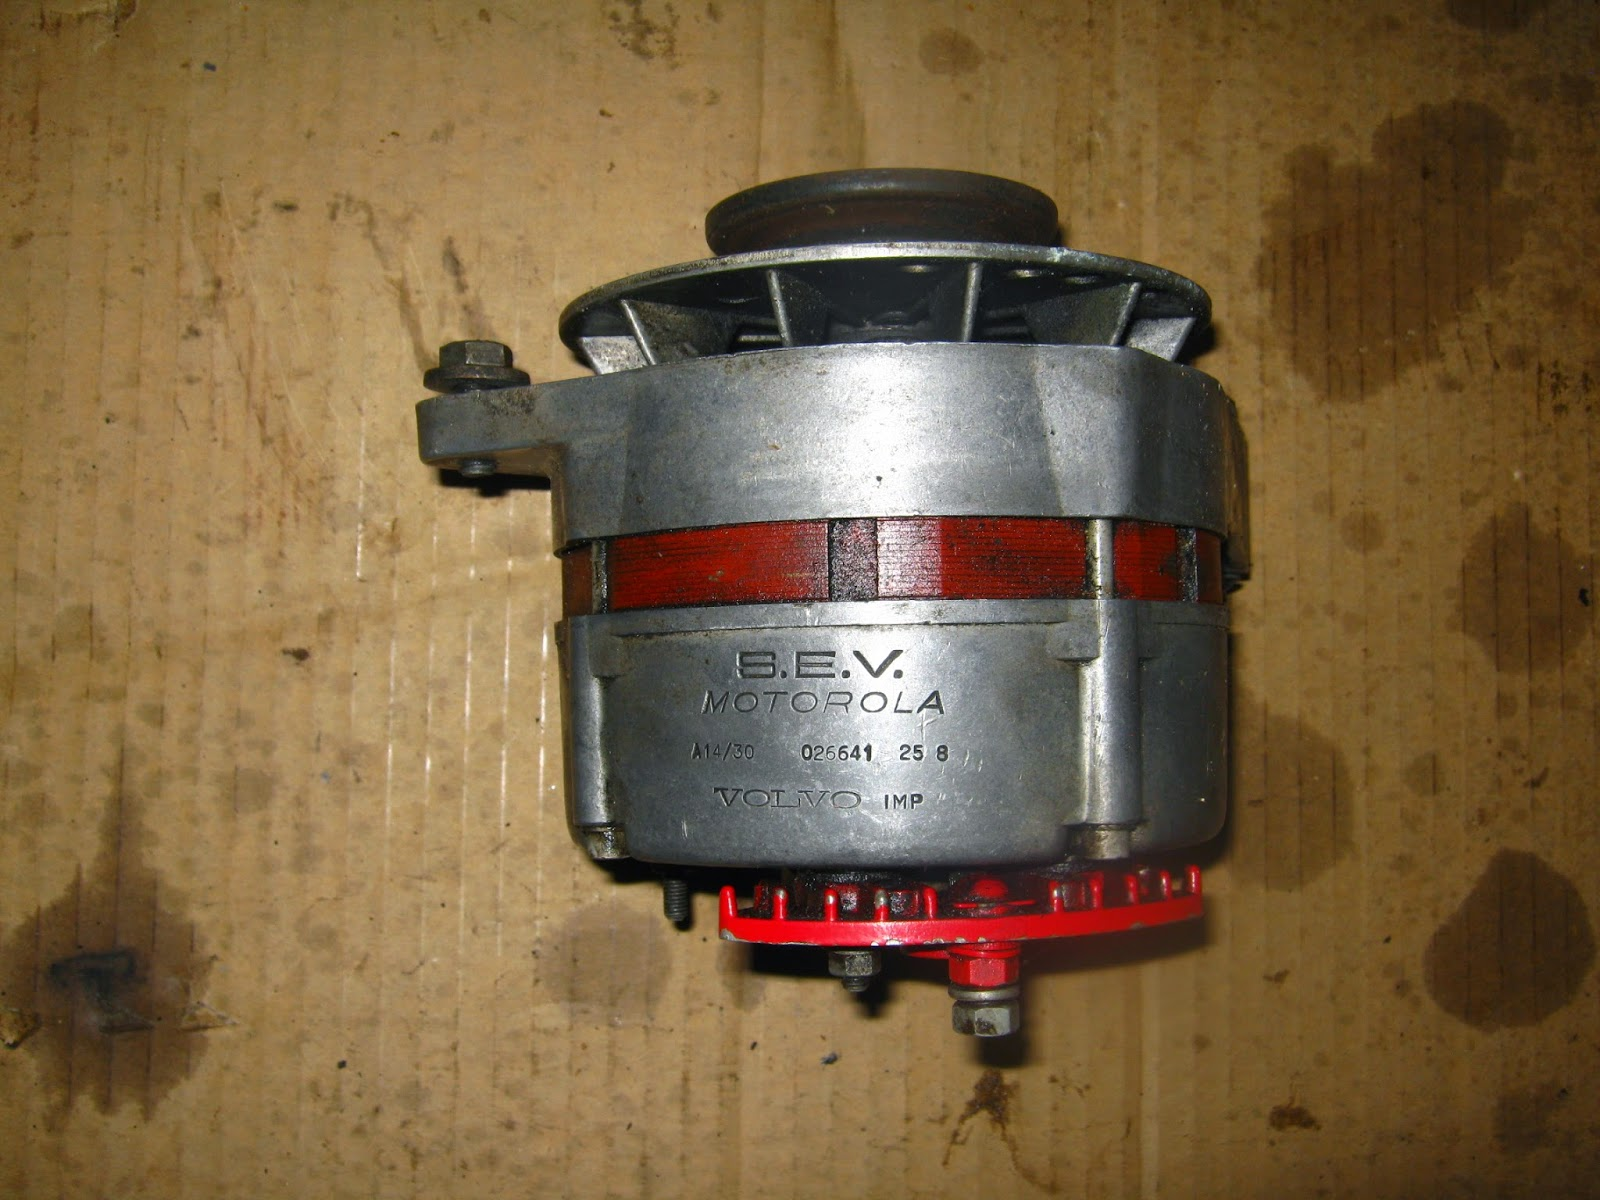 medium resolution of motorola alternator 30 amp volvo amazon p130